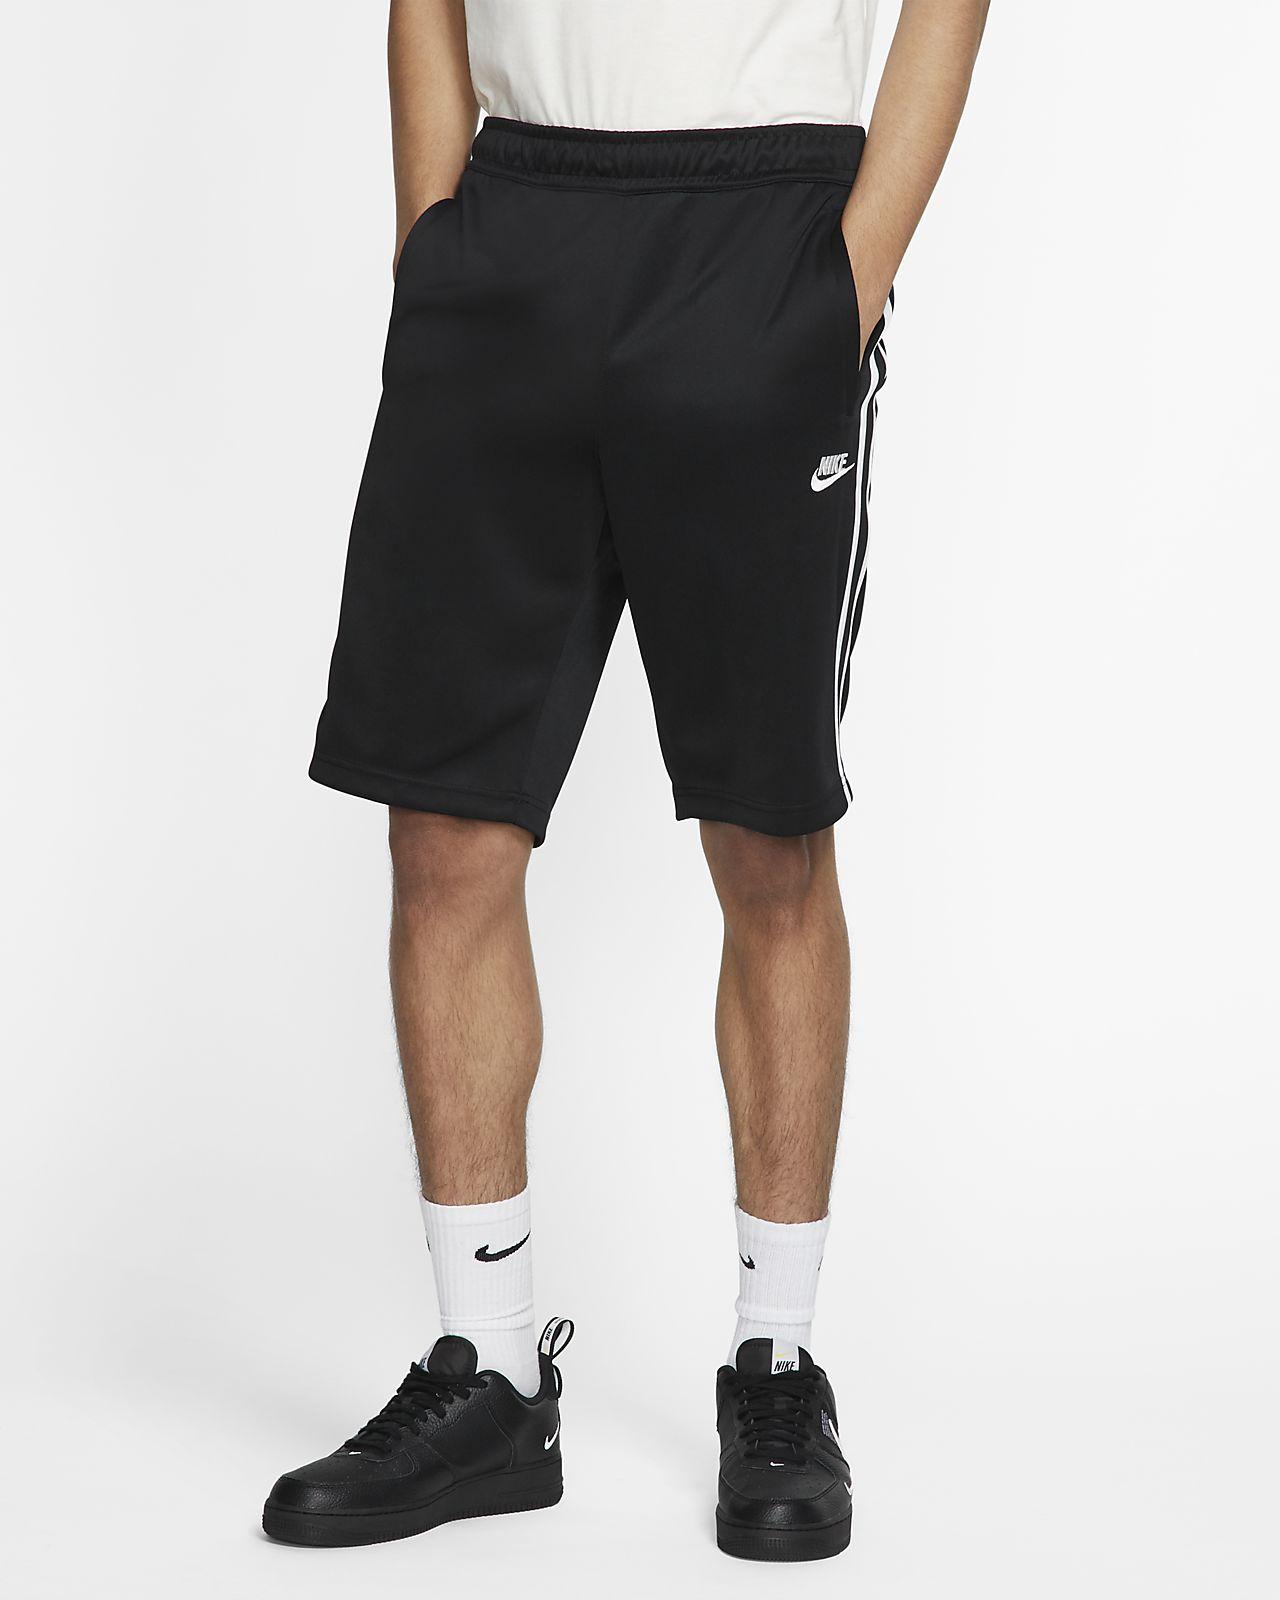 pretty nice 8284a 6f036 Shorts Nike Sportswear för män